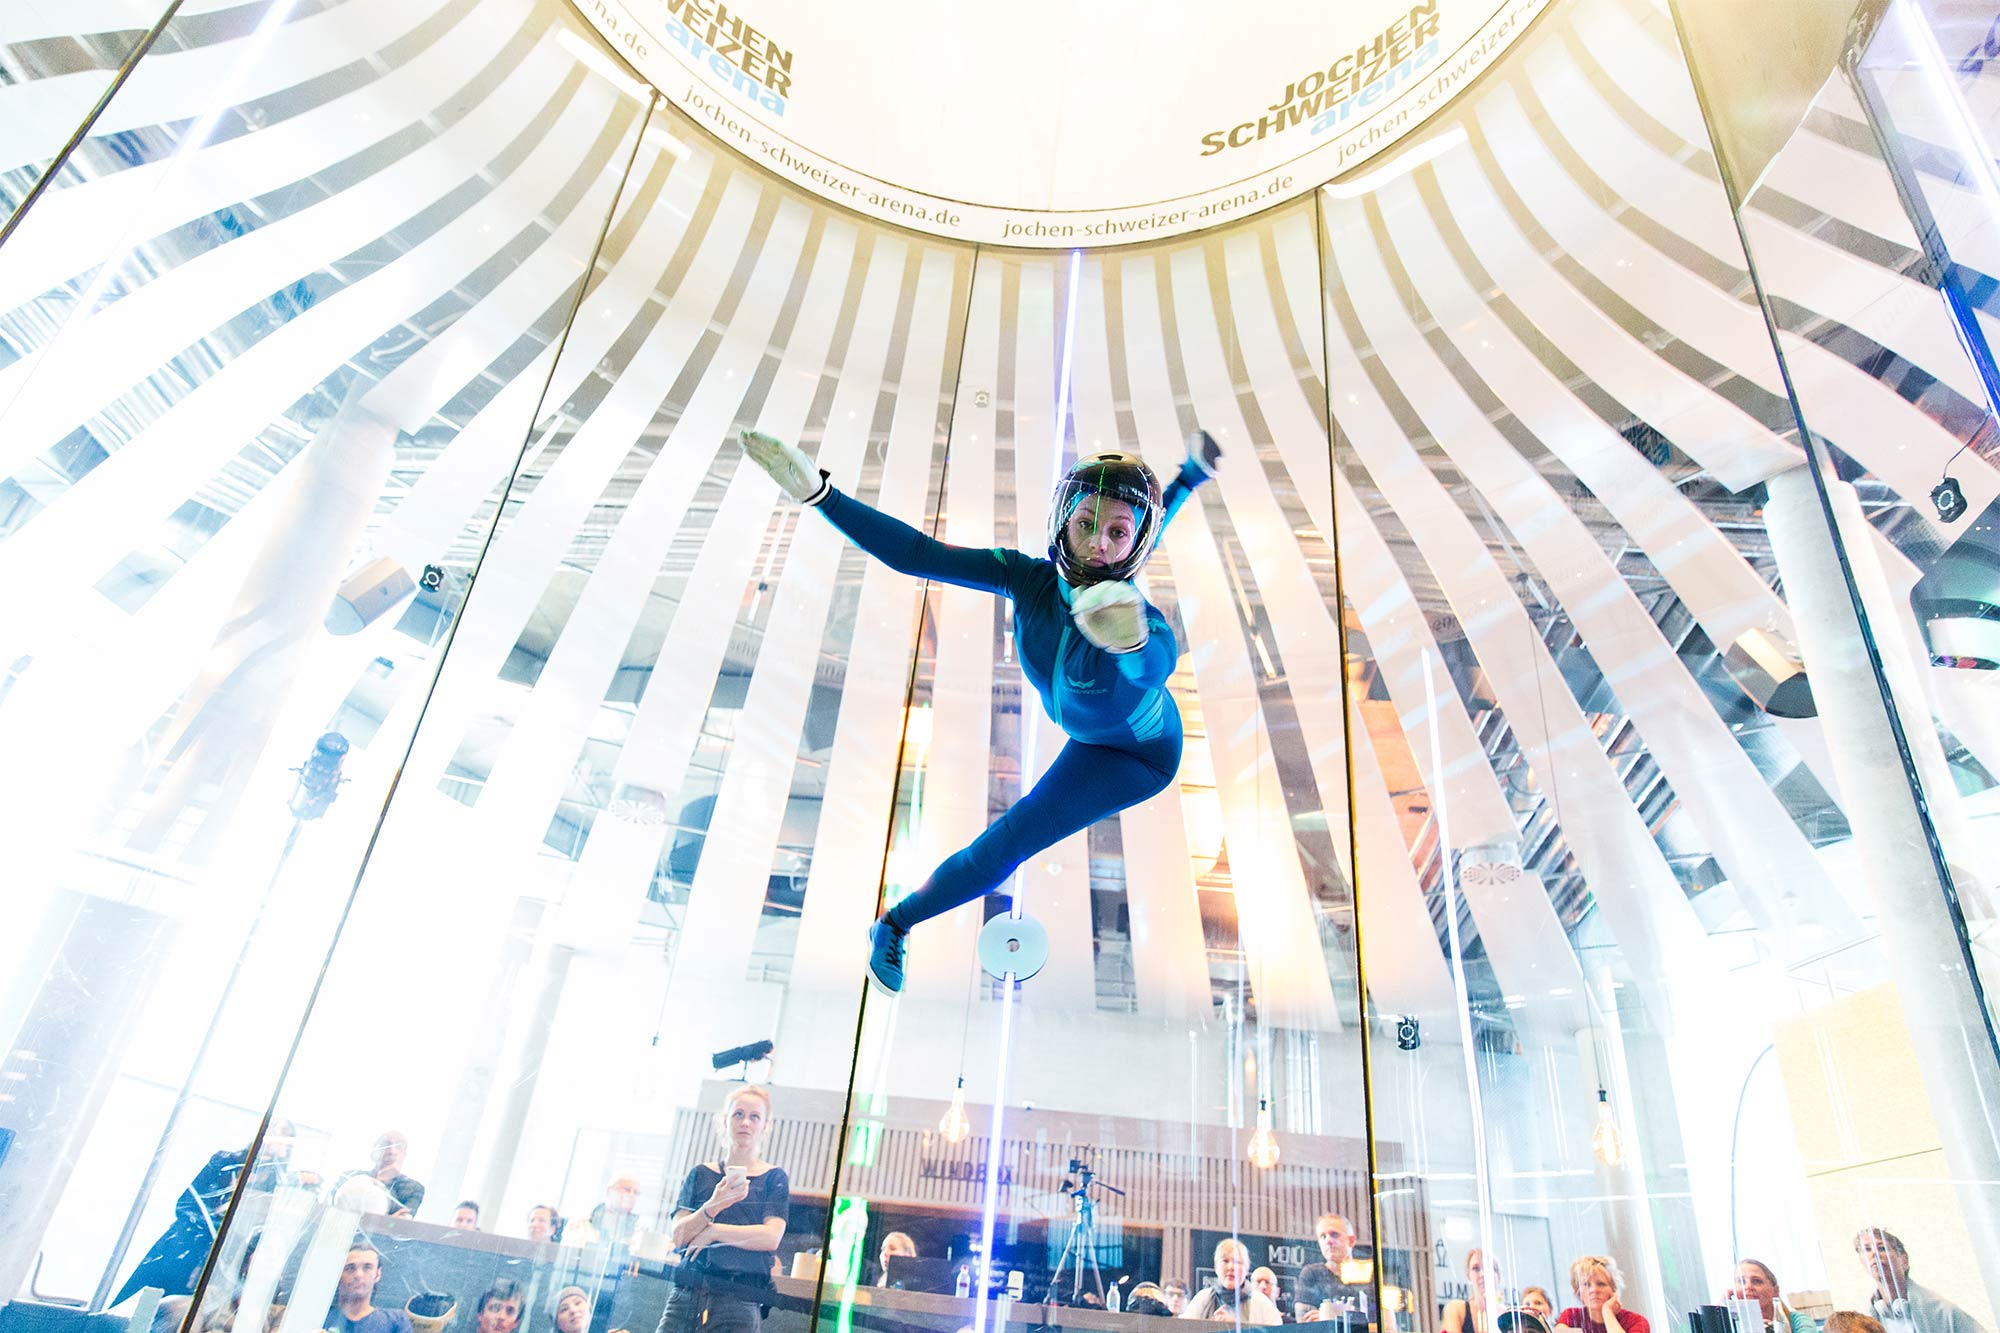 Laura beim Freestyle @ indoorDM2019 © elmar.pics